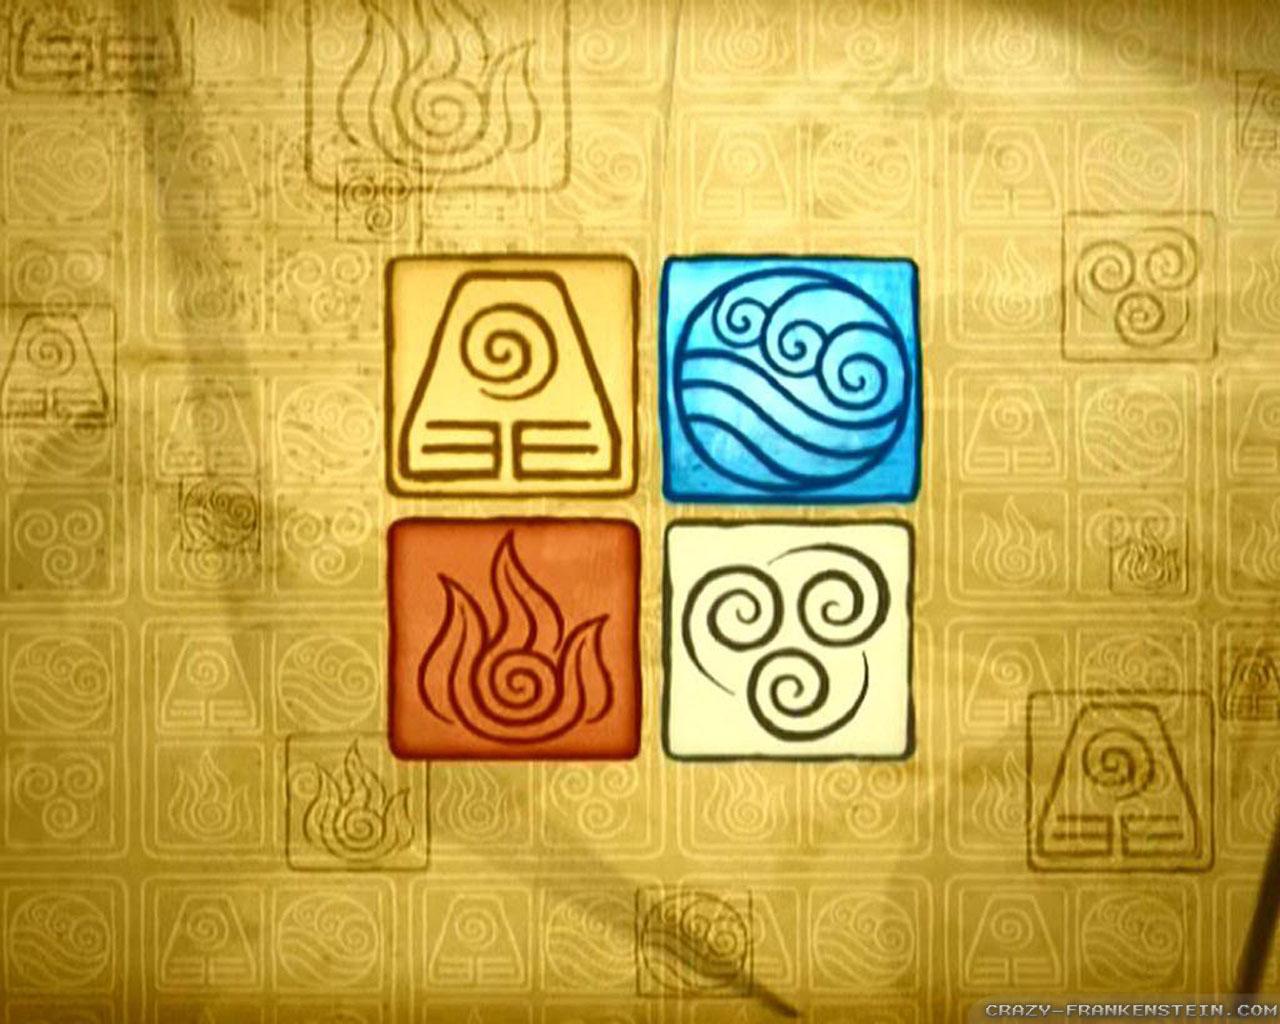 Avatar The Last Airbender Wallpaper Elements Avatar Element